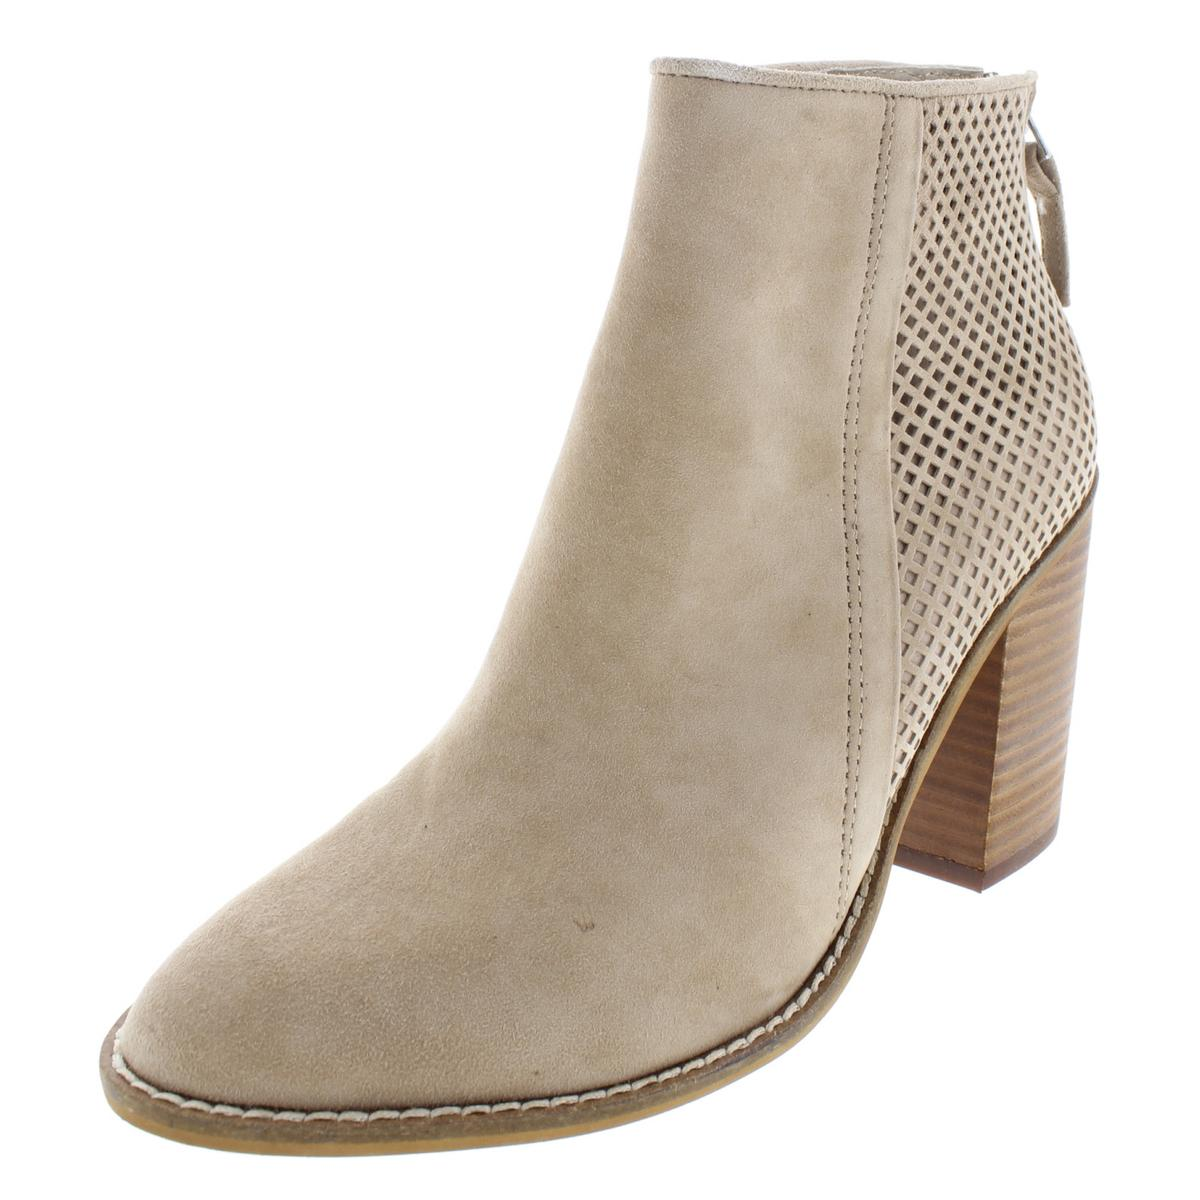 Steve Madden Femme Replay Tan Suede Chaussons Chaussures 10 moyen (B, M) BHFO 1781